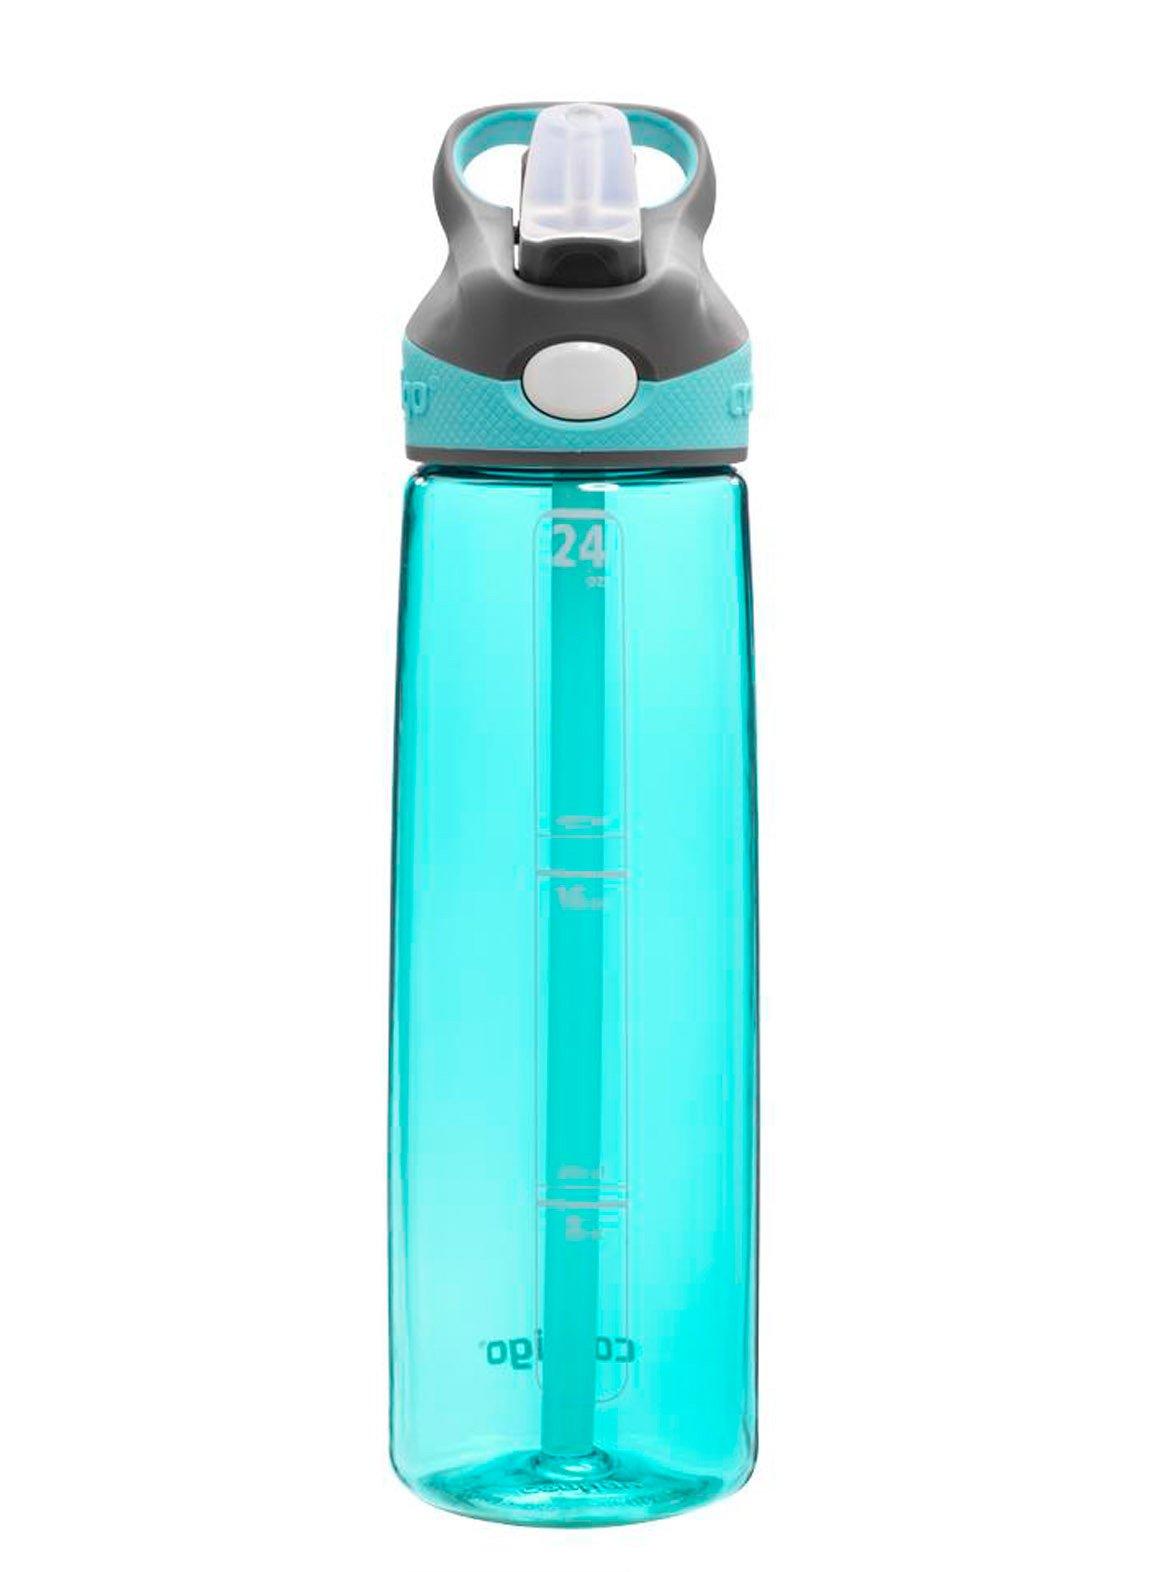 Contigo AUTOSPOUT Straw Addison Water Bottle, 24 oz, Ocean